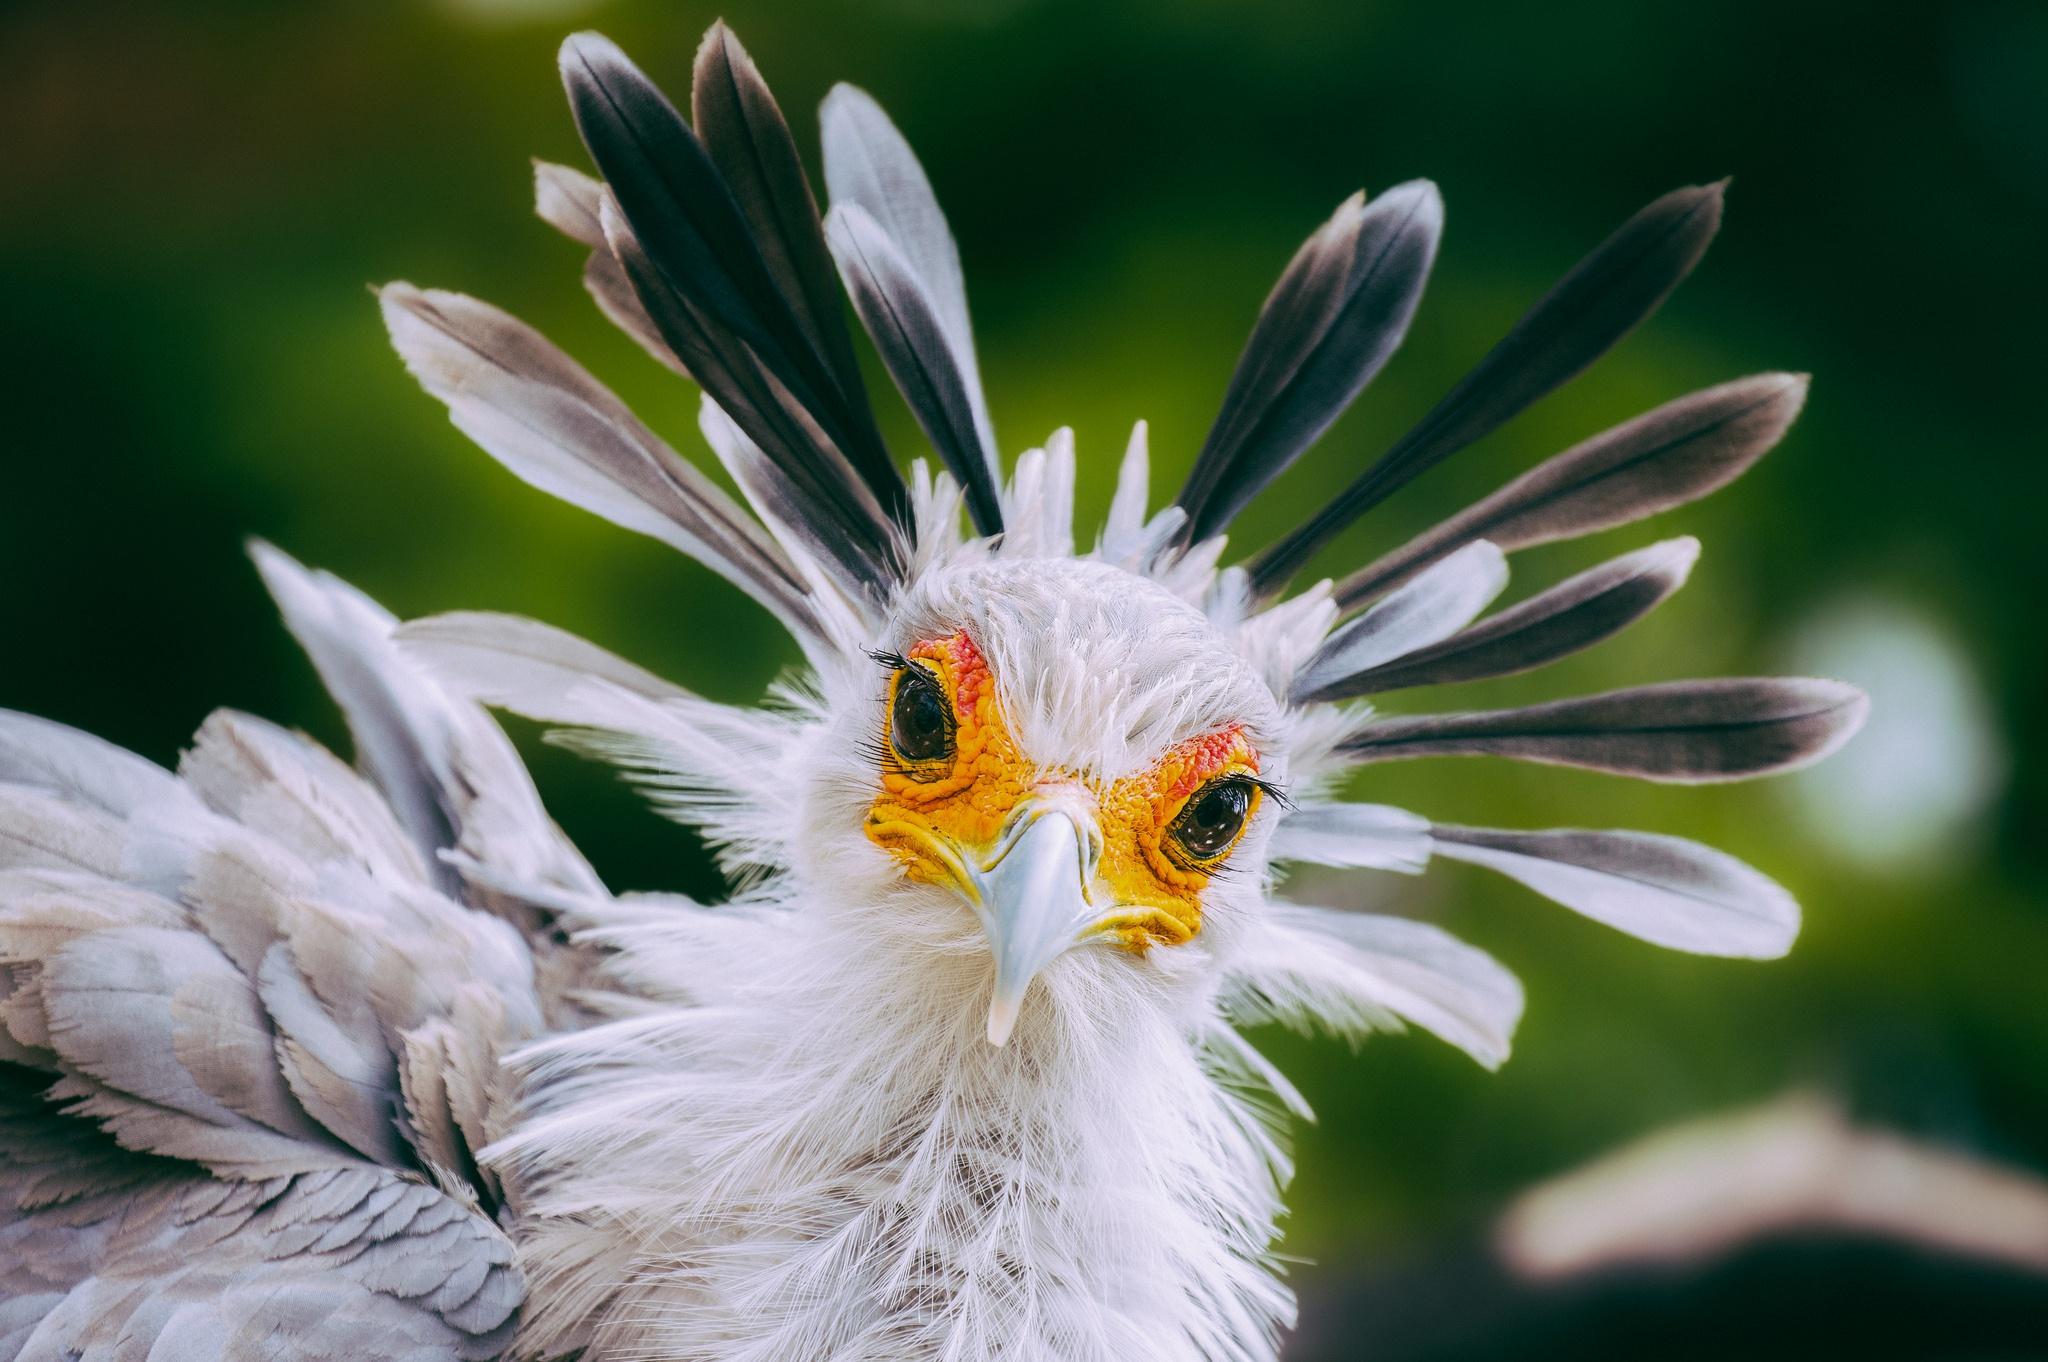 зависимости птица с ресницами фото более